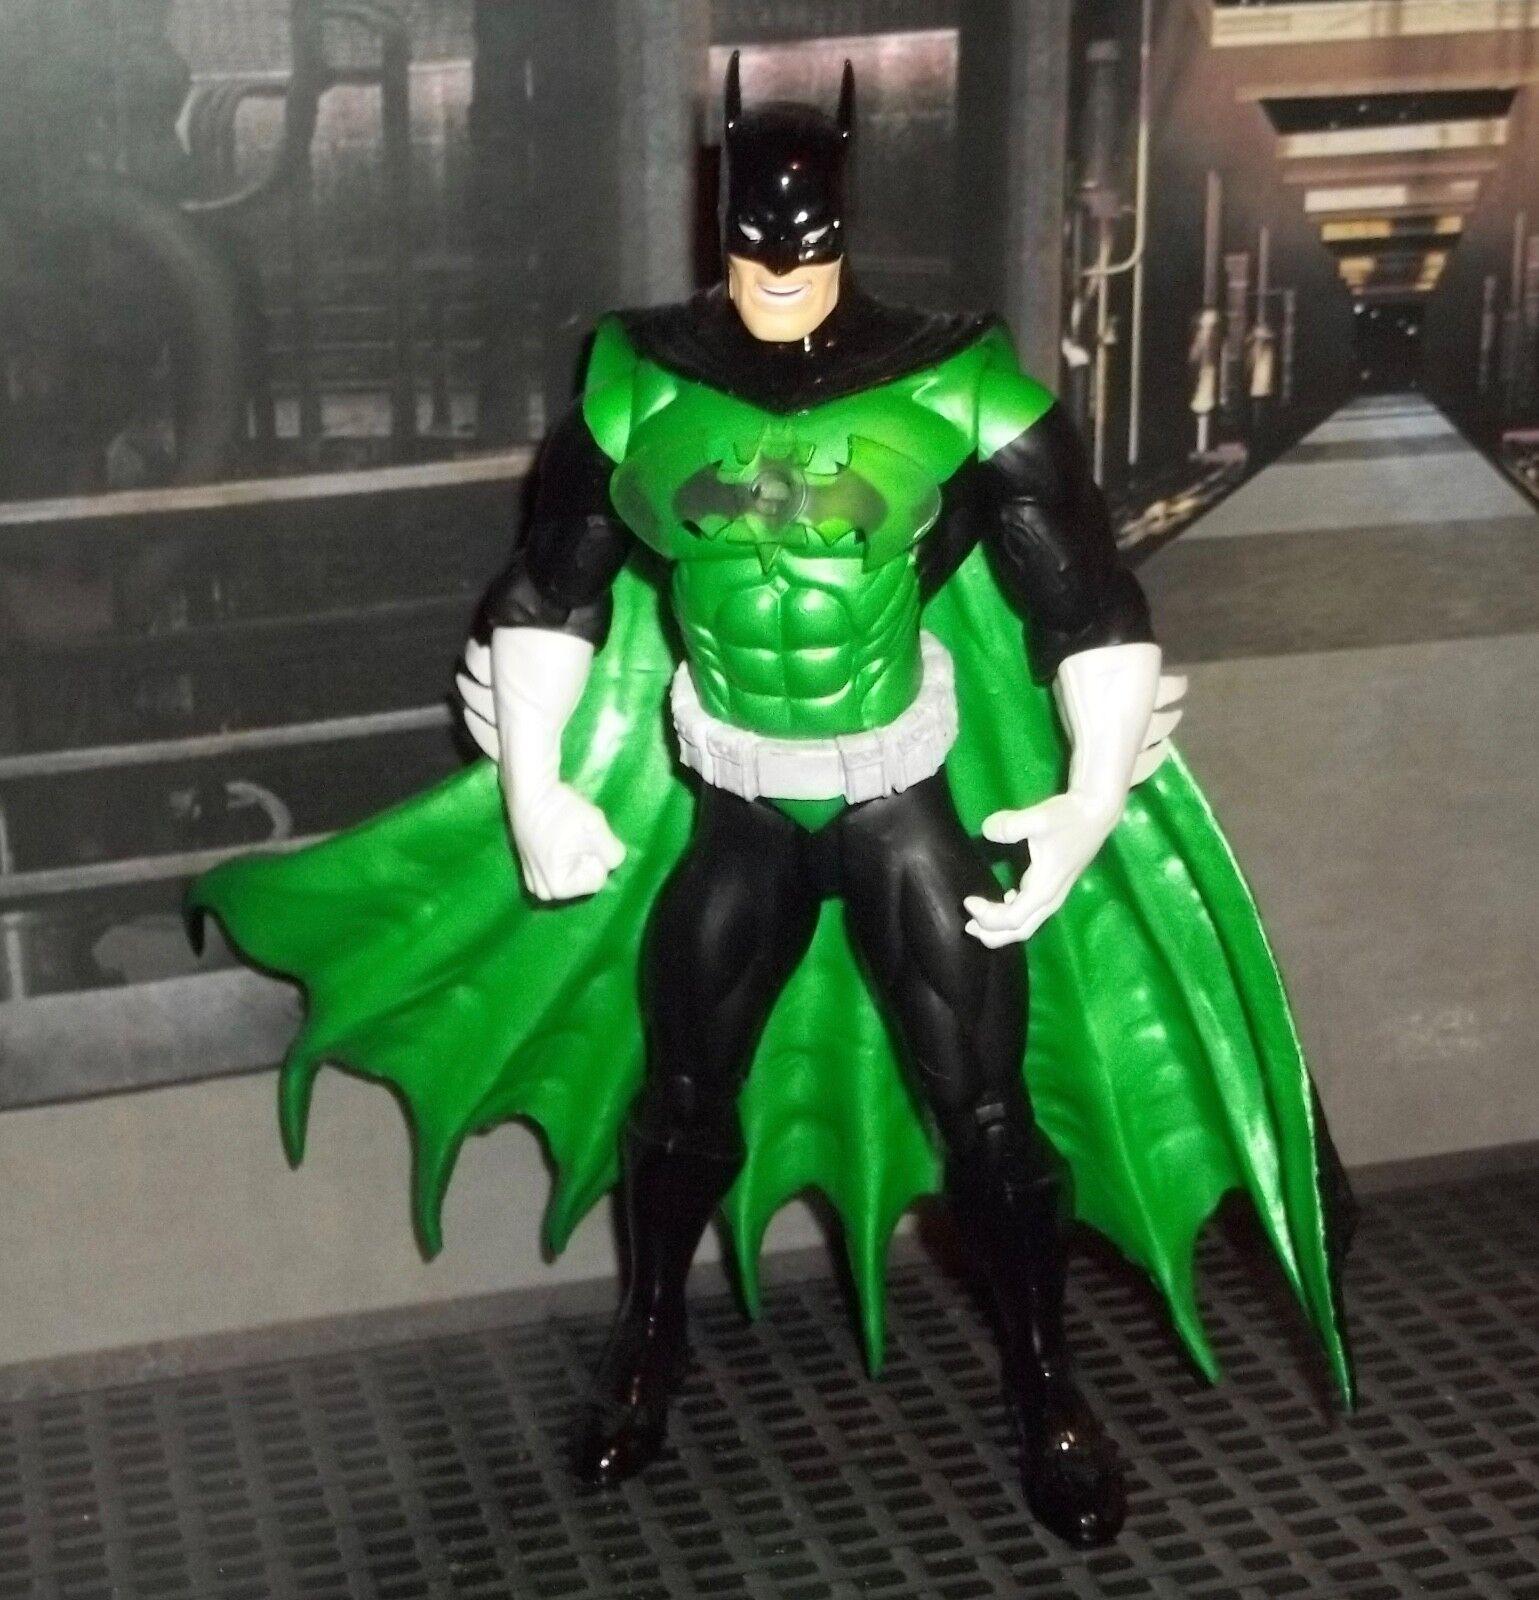 DC DIRECT COLLECTIBLES verde LANTERN SERIES 3 BATMAN AS verde LANTERN FIGURE